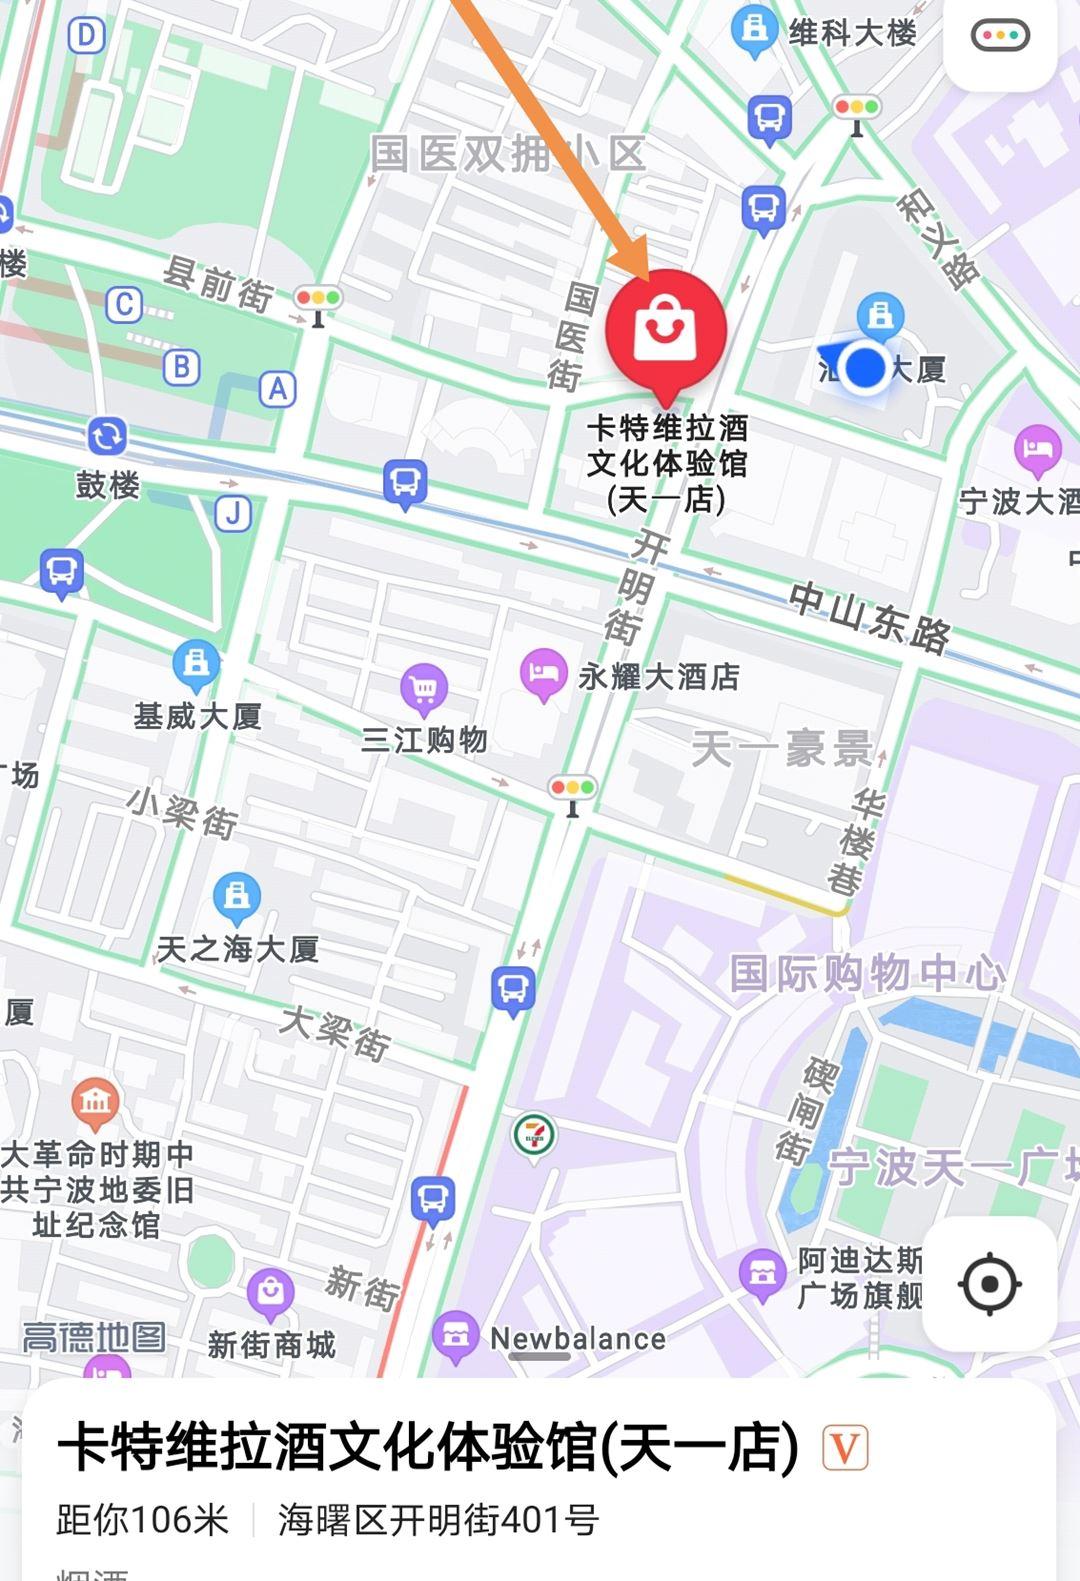 http://www.huodongxing.com/file/20190114/1133300437025/104169531473093.jpg